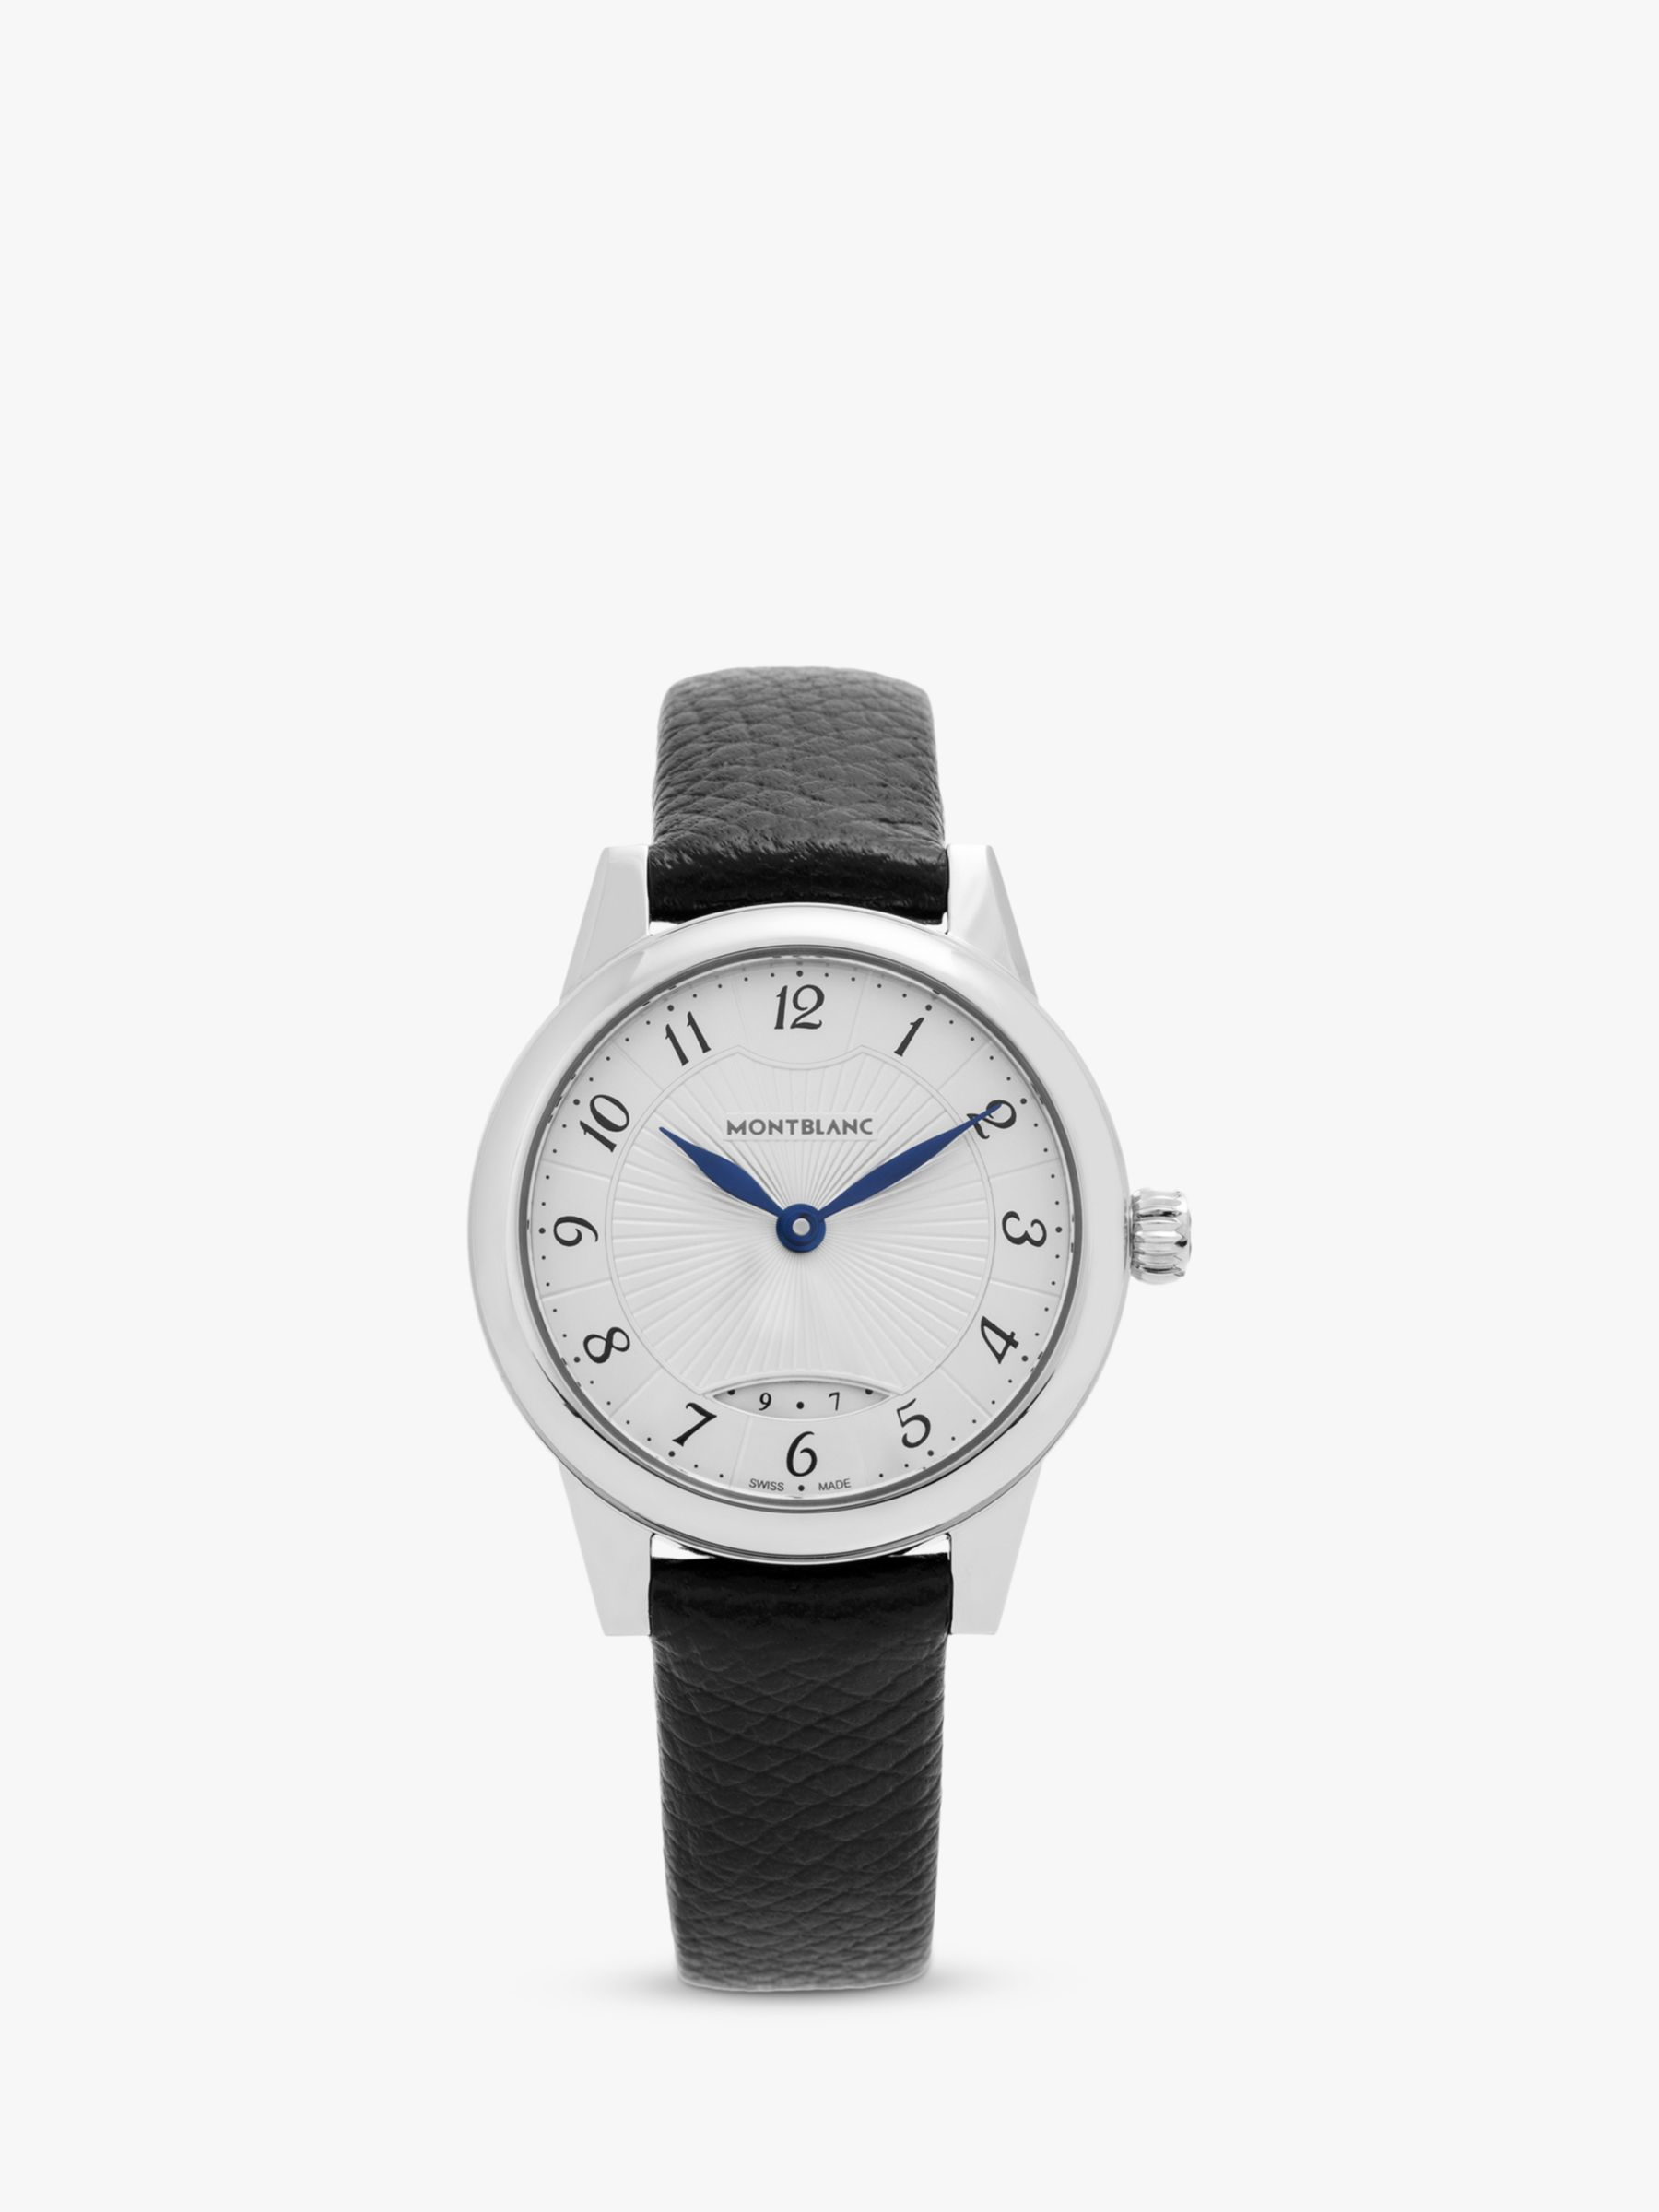 Montblanc Montblanc 111206C Women's Boheme Date Leather Strap Watch, Black/White